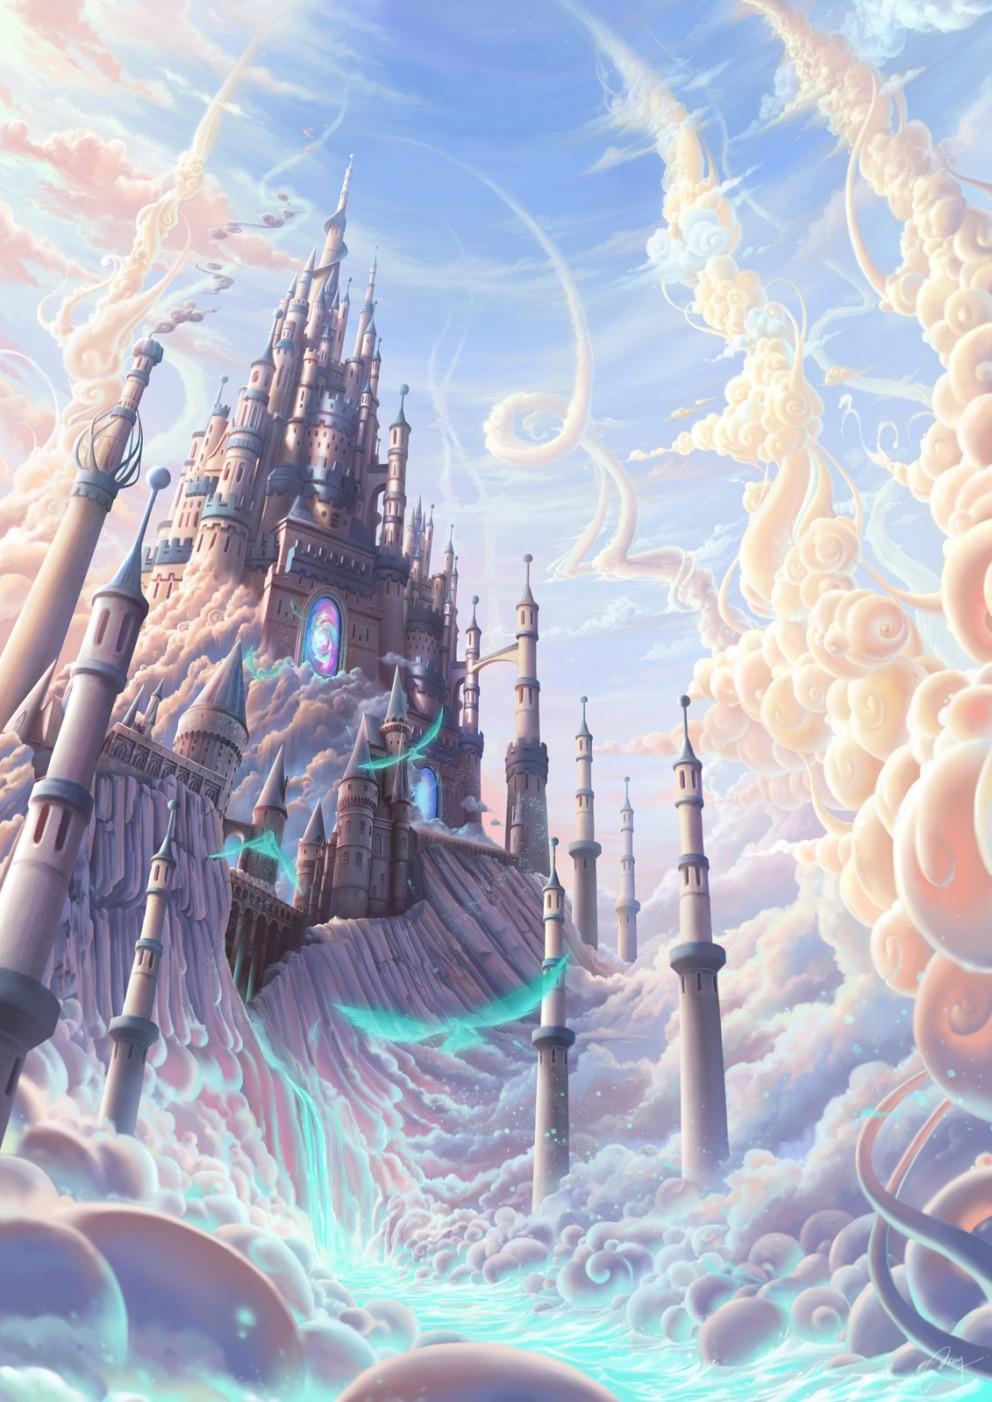 landscapes castles fantasy art - photo #32